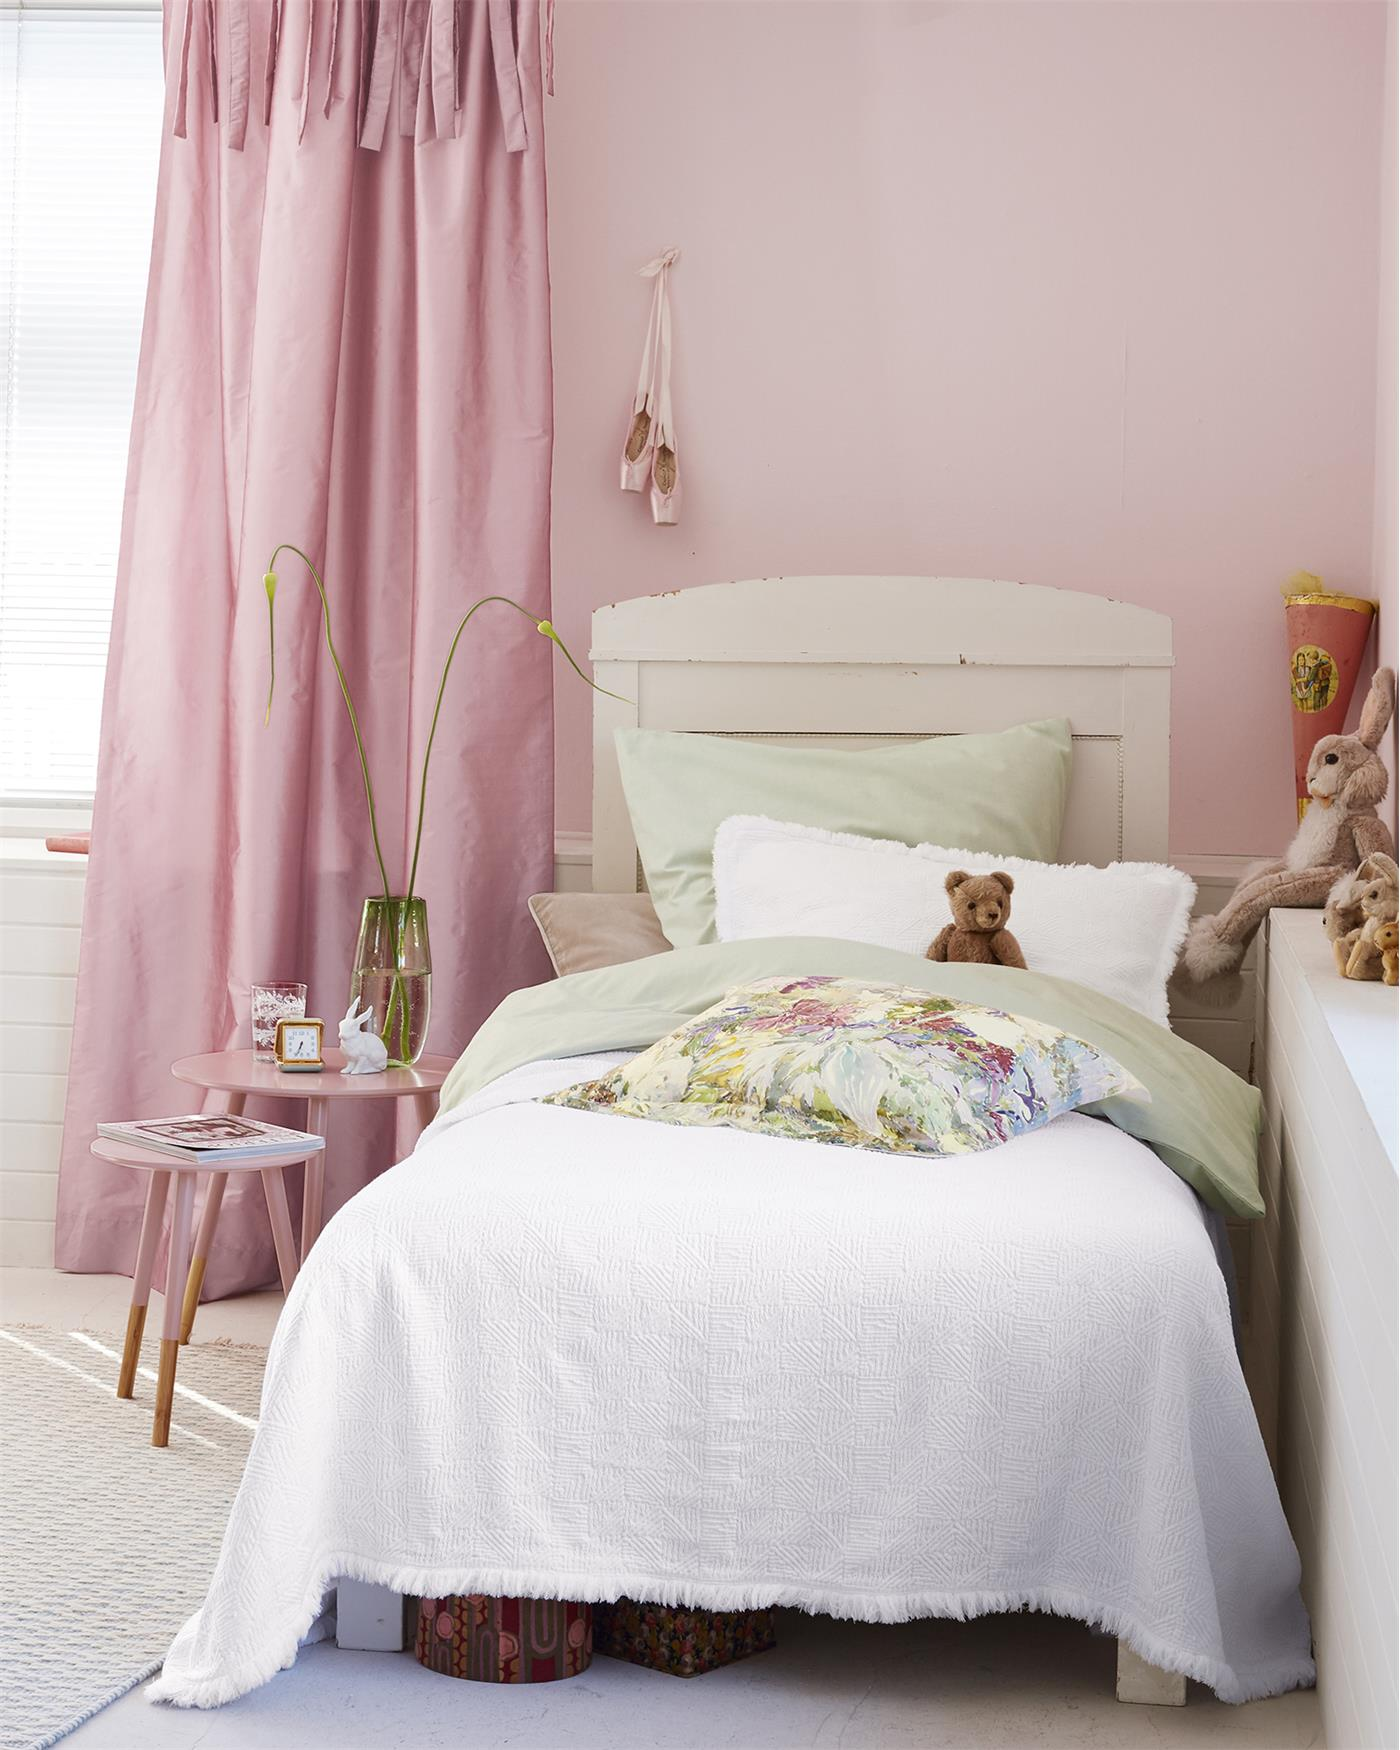 beautiful tagesdecke fur bett 25 wunderschone beispiele. Black Bedroom Furniture Sets. Home Design Ideas